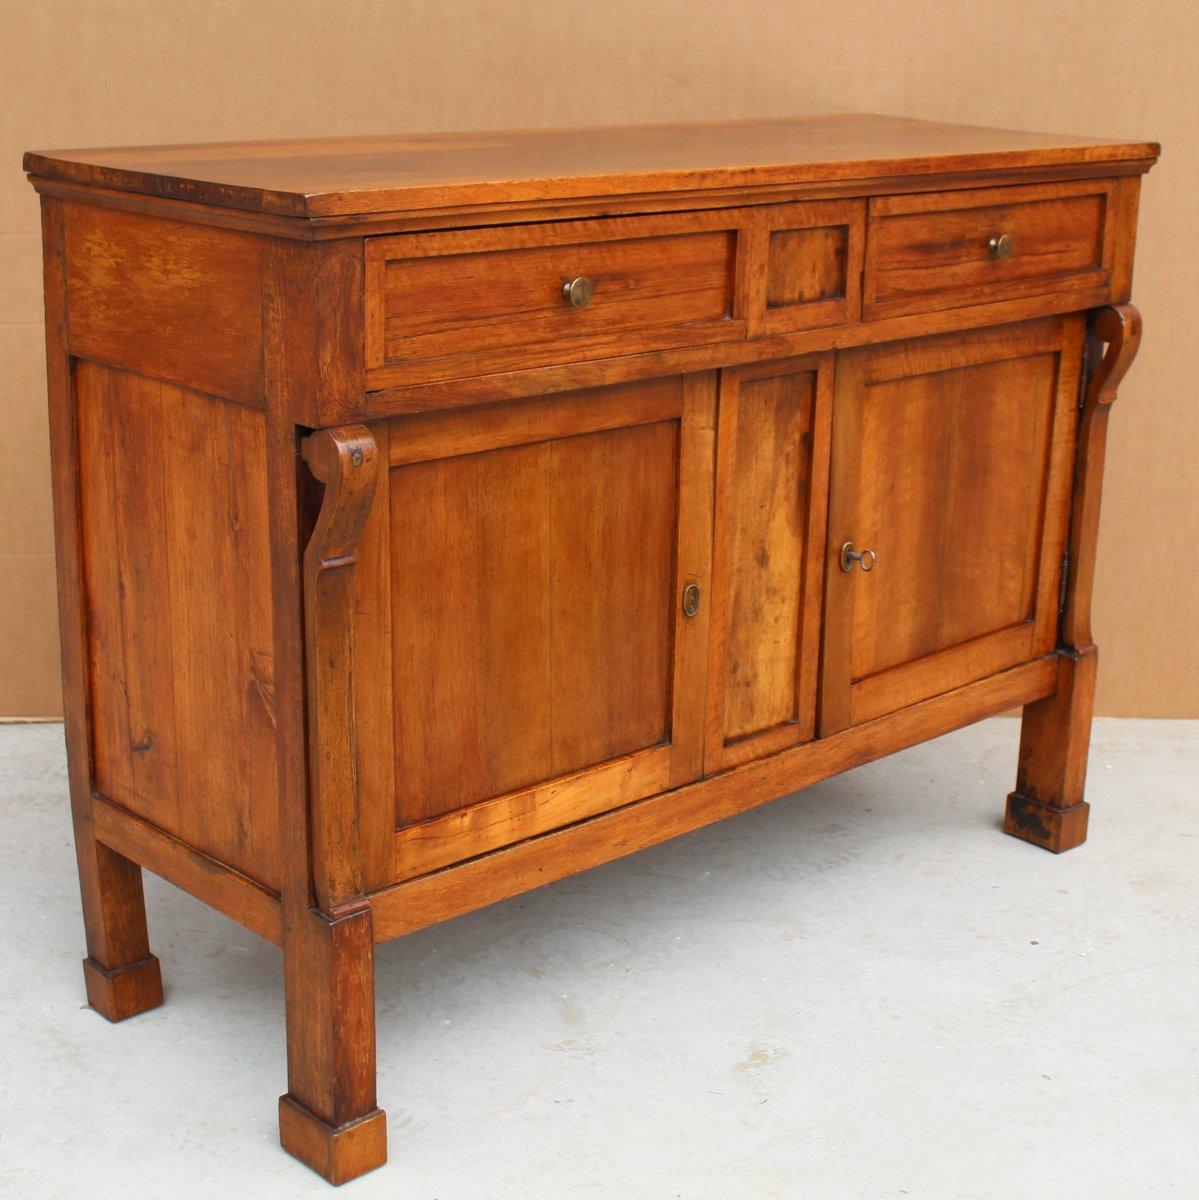 Antique Empire Sideboard Dresser Cabinet Cupboard Buffet In Walnut - Italy 19th-photo-4